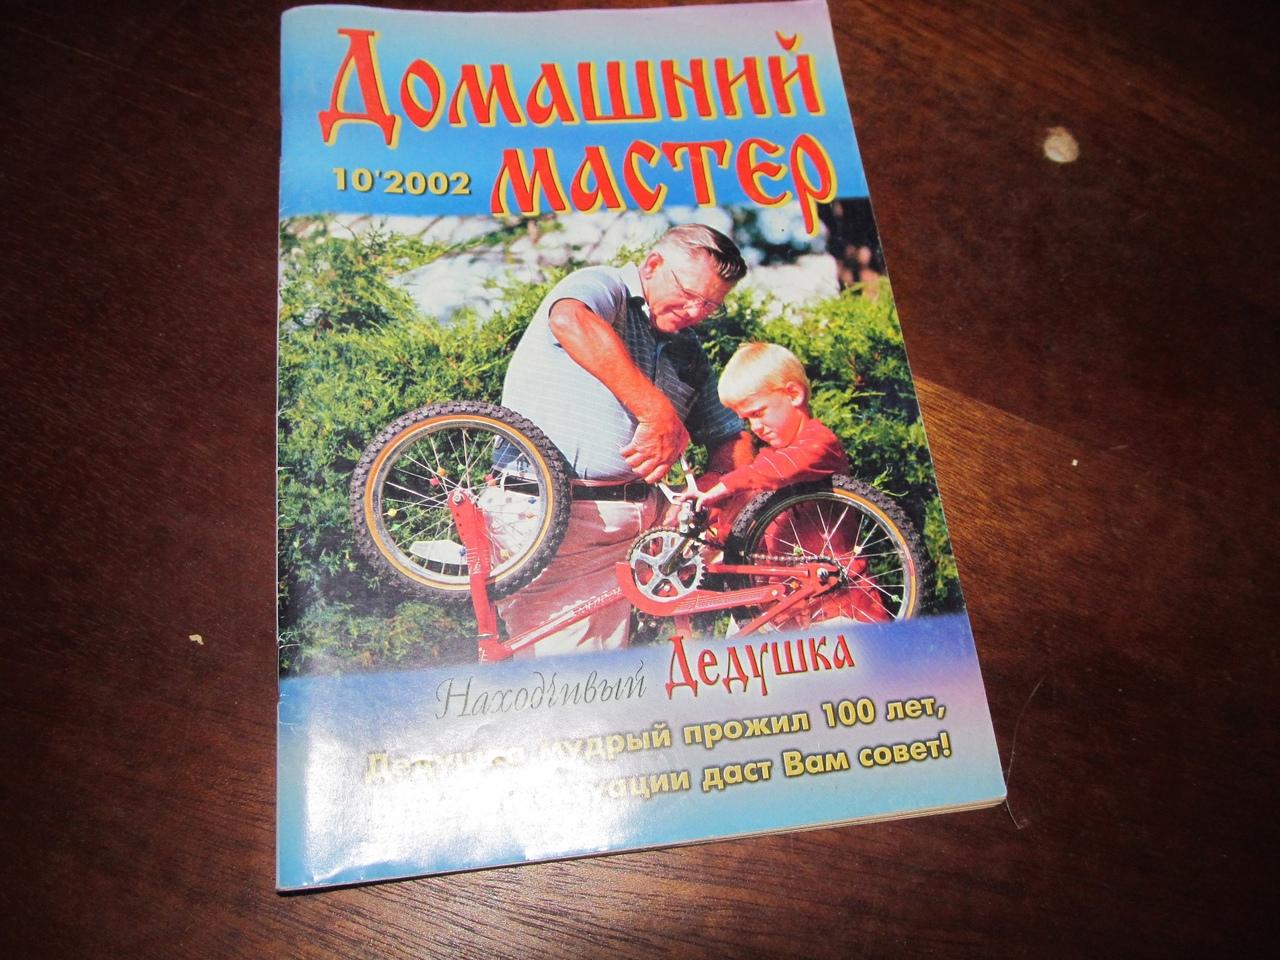 3)Домашний Мастер. Находчивый дедушка №10 2002  Цена 40 грн.